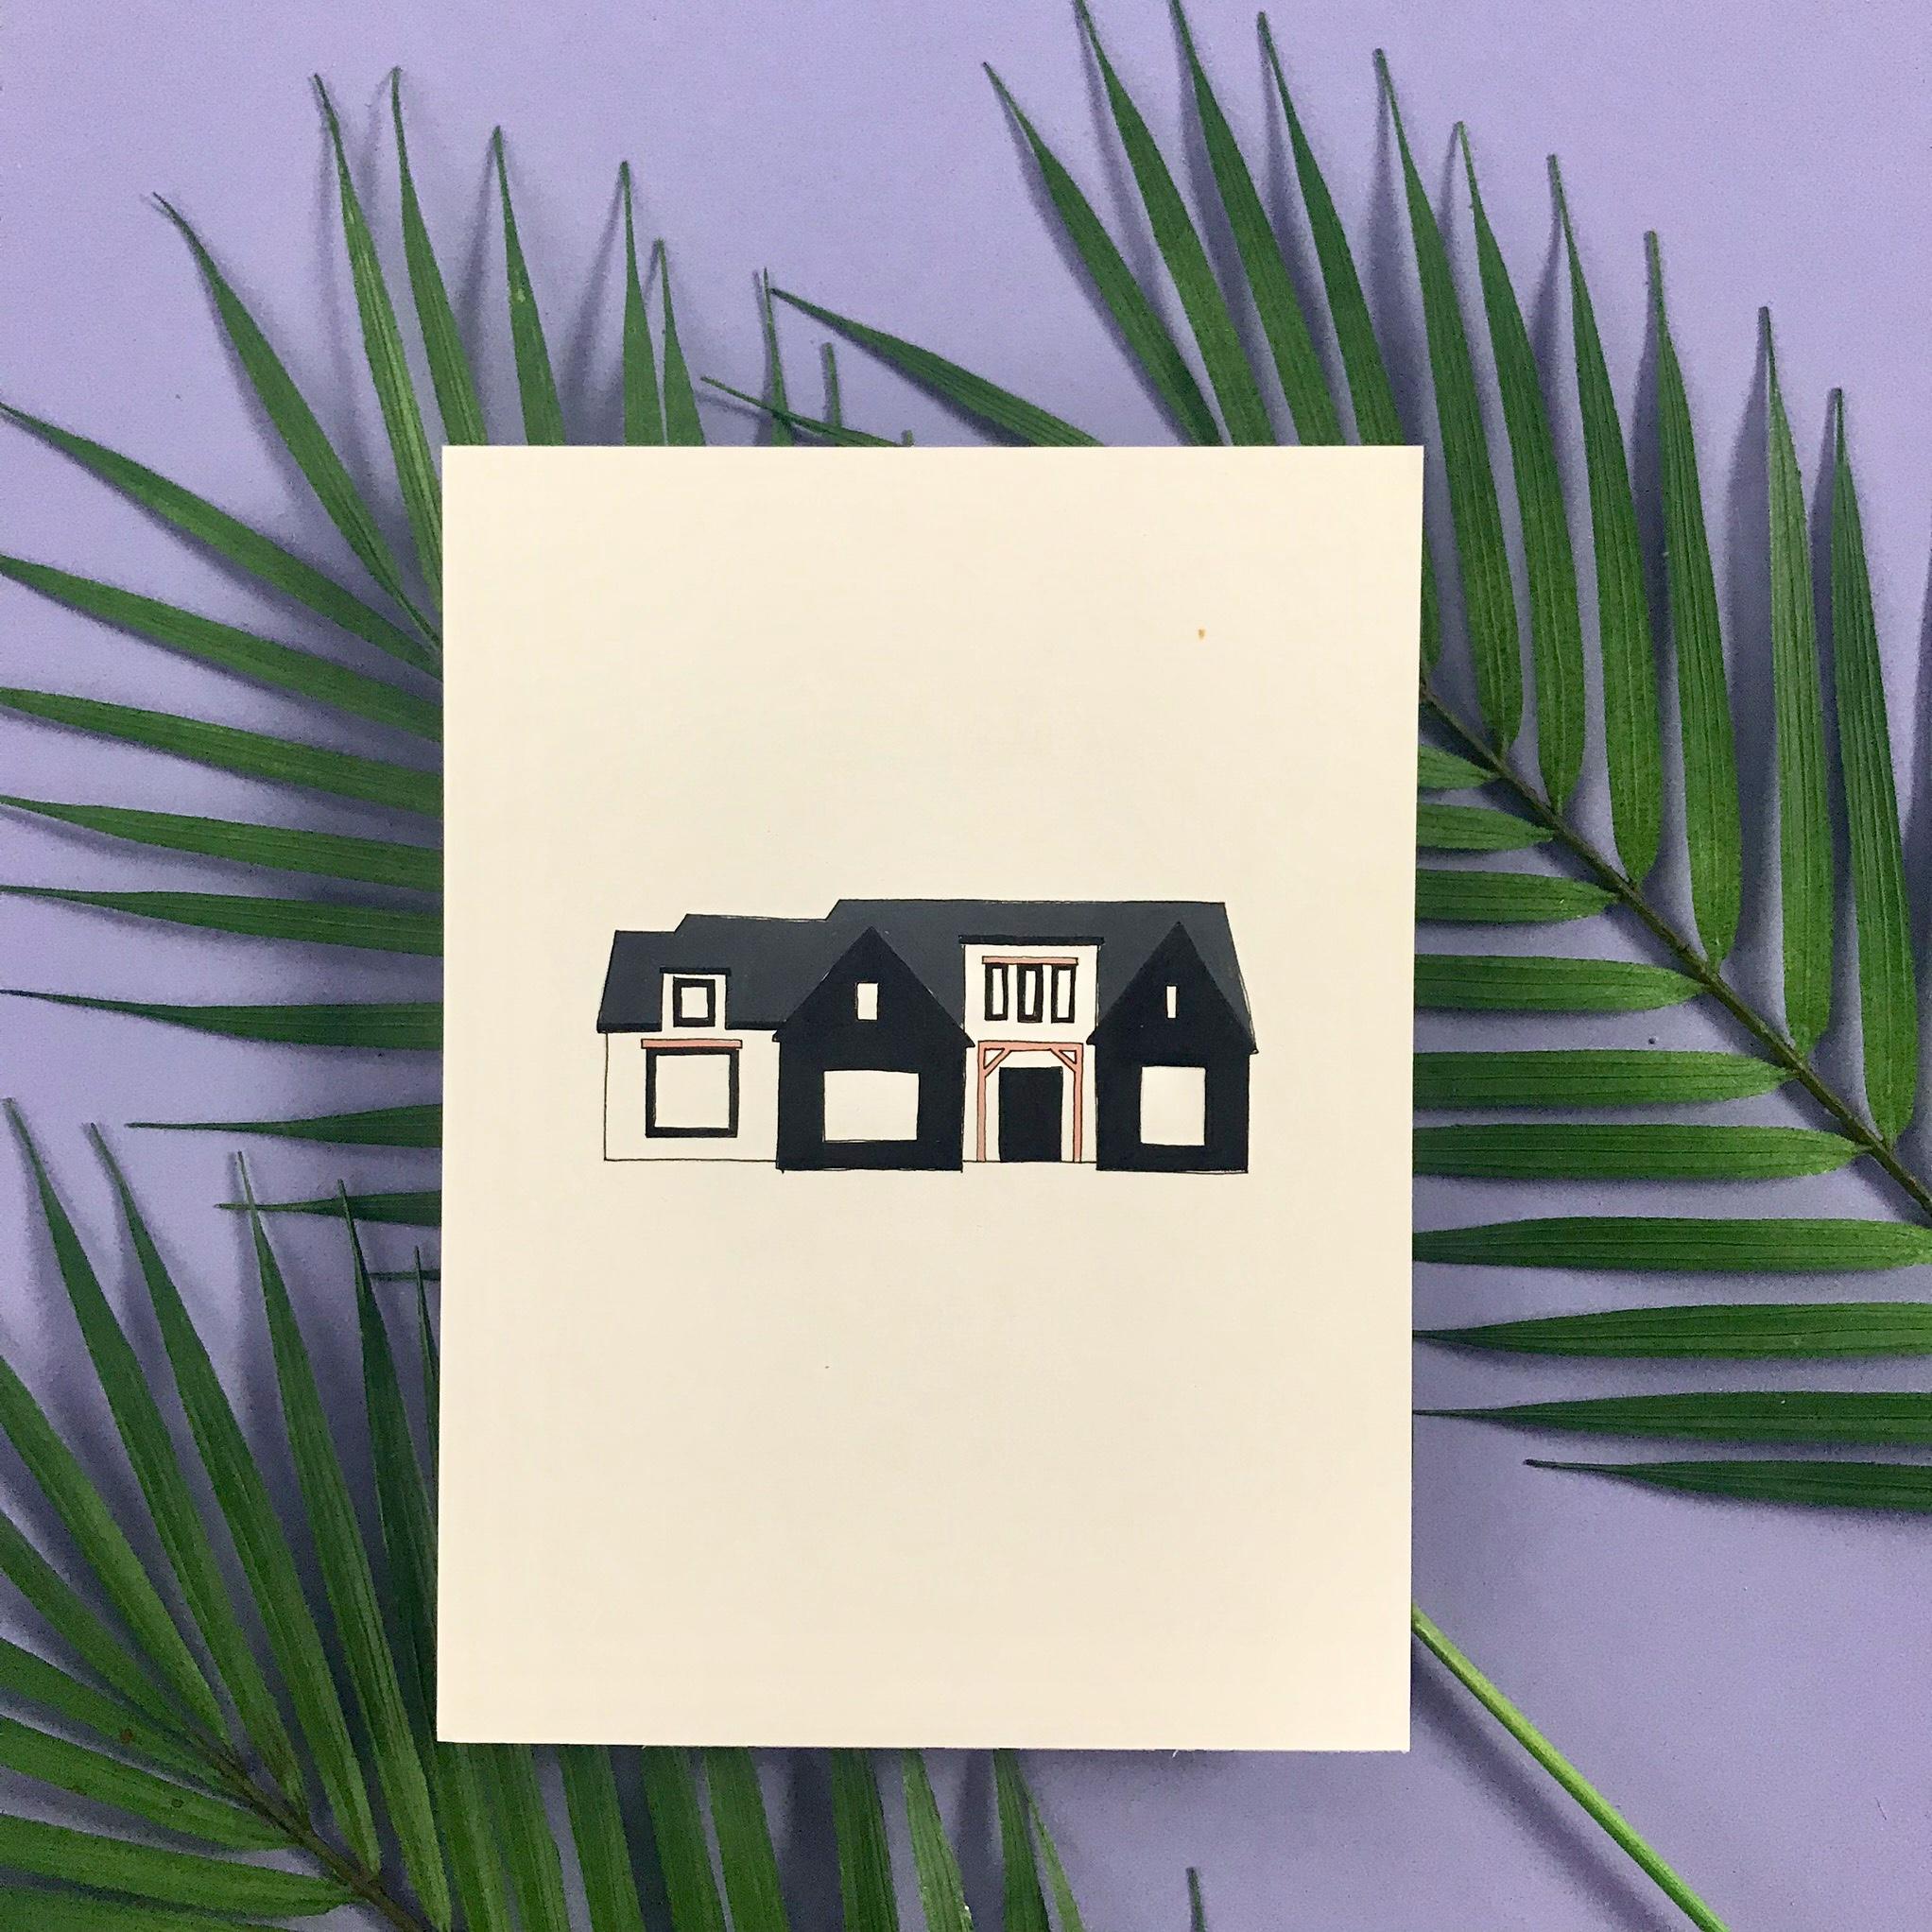 6X8 HOME - $115